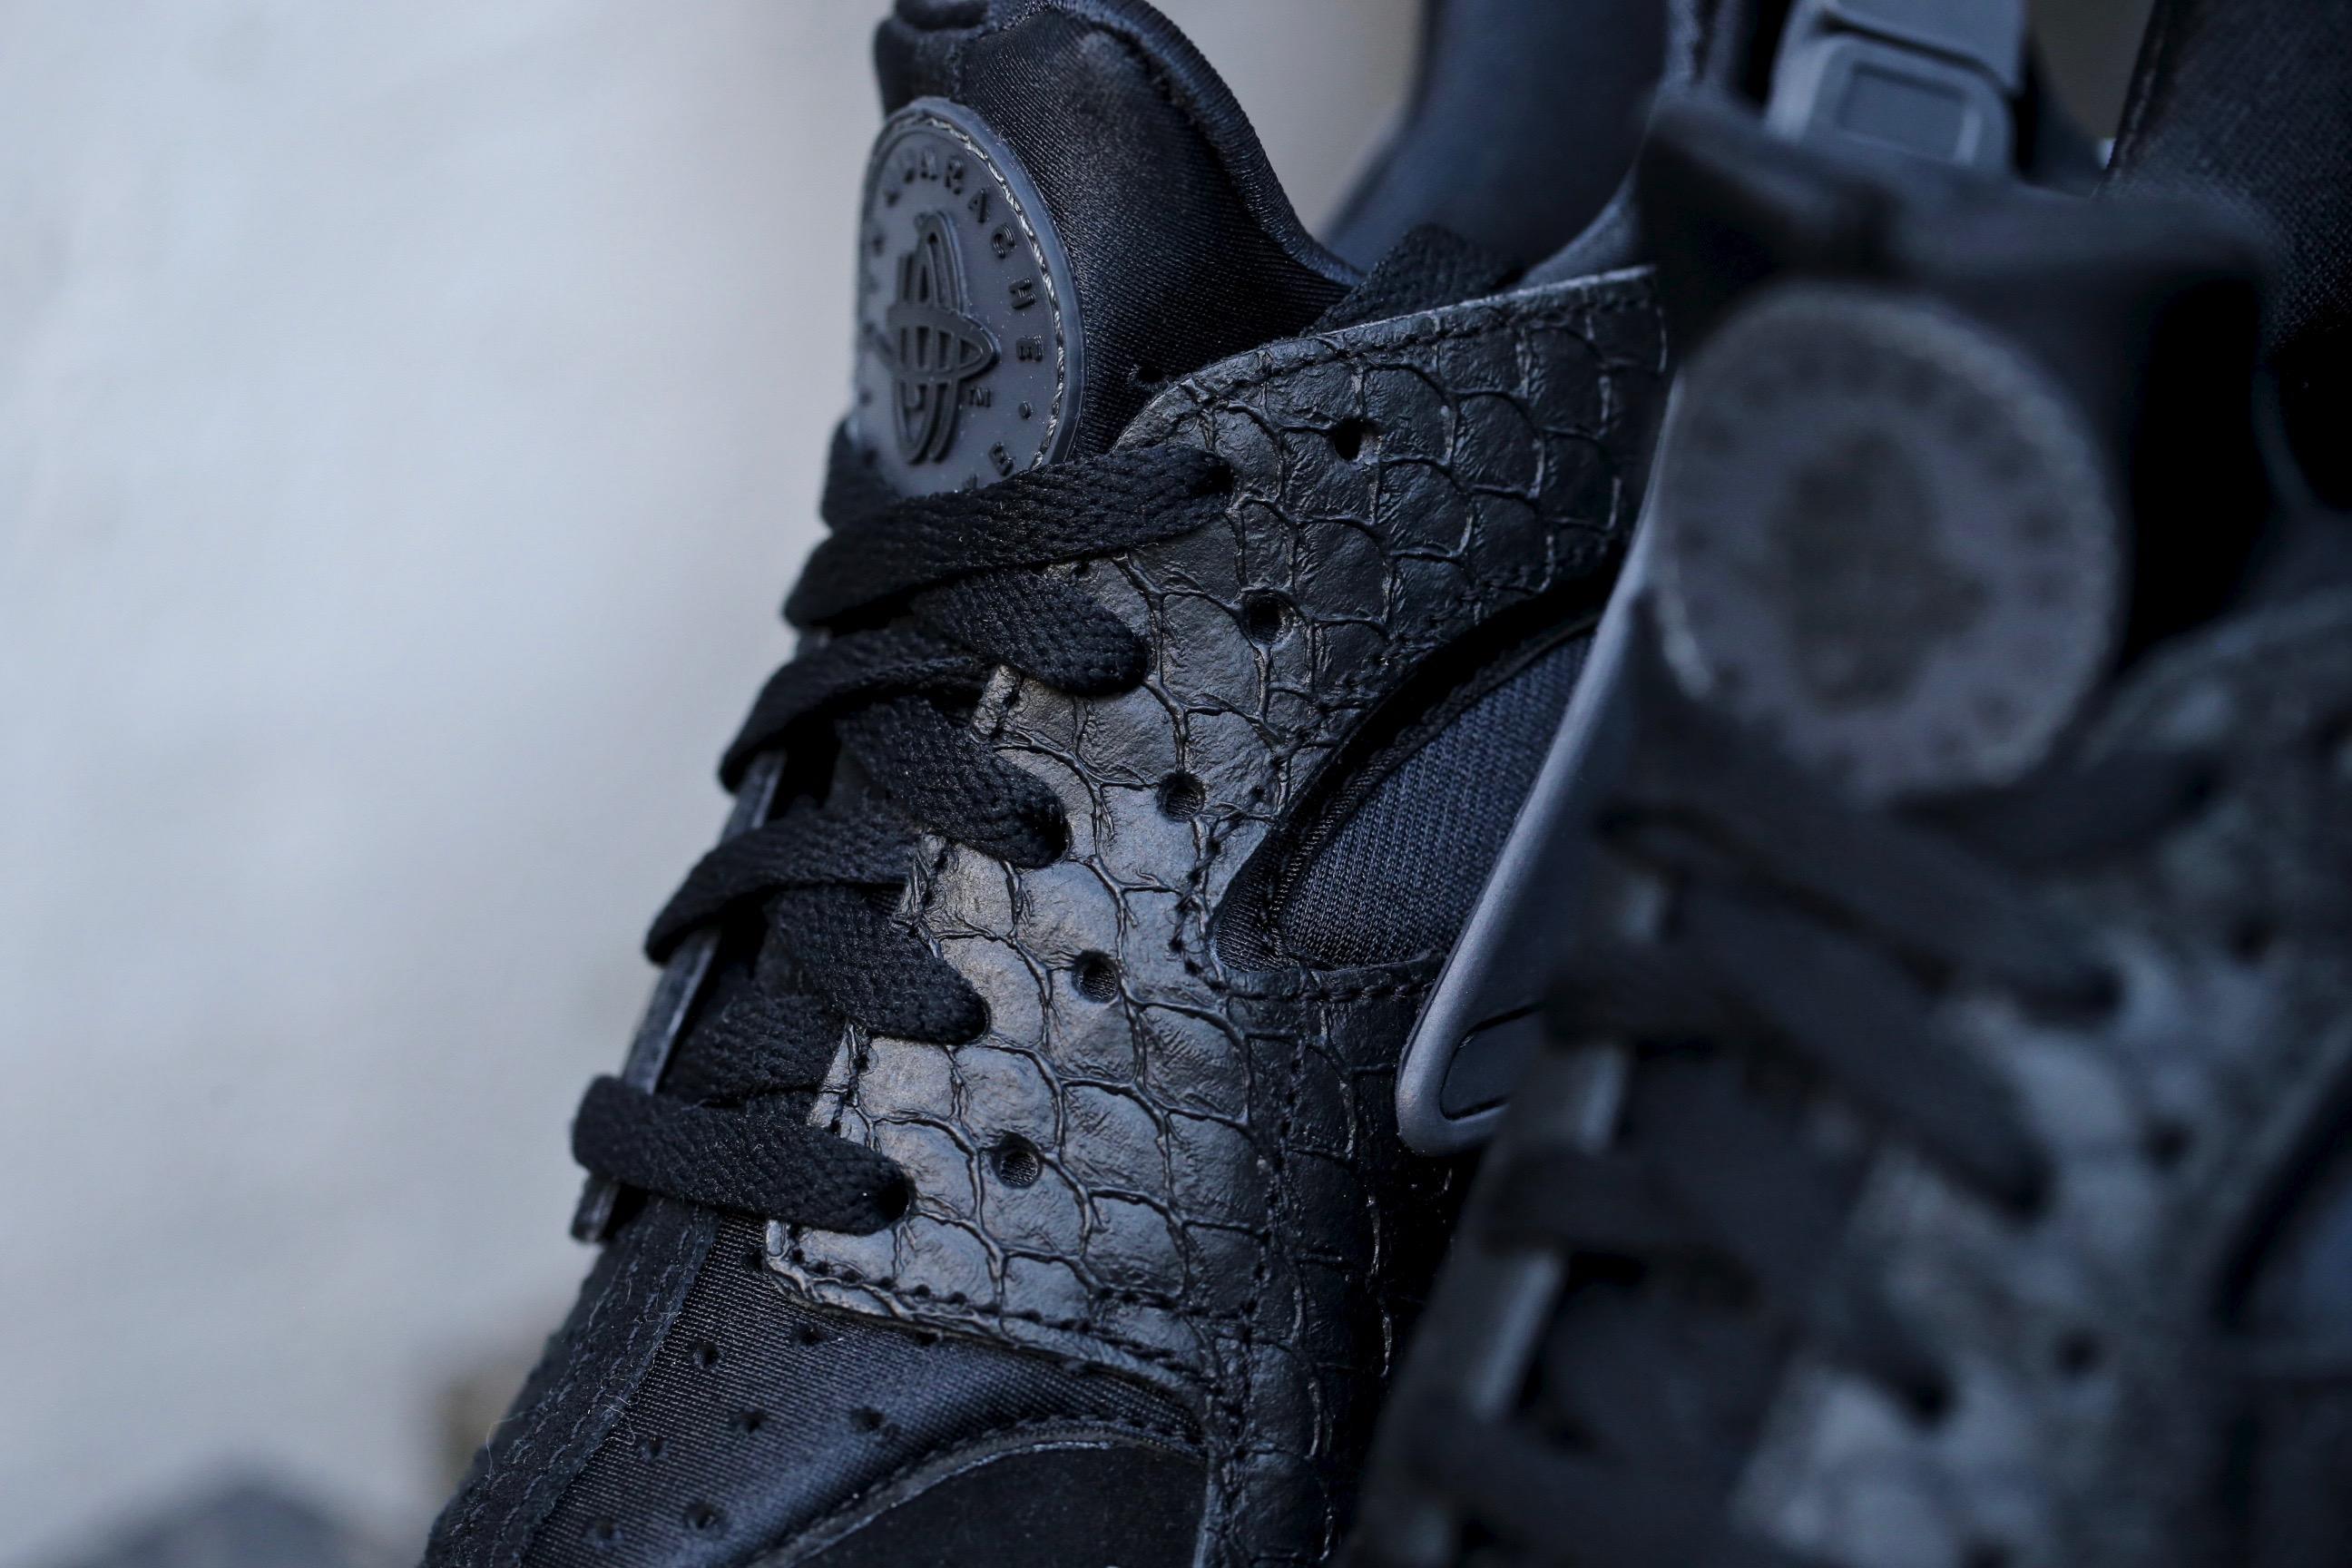 Nike Air Huarache Løp Premie (svart / Mørk Grå-hvit) eK0Eo